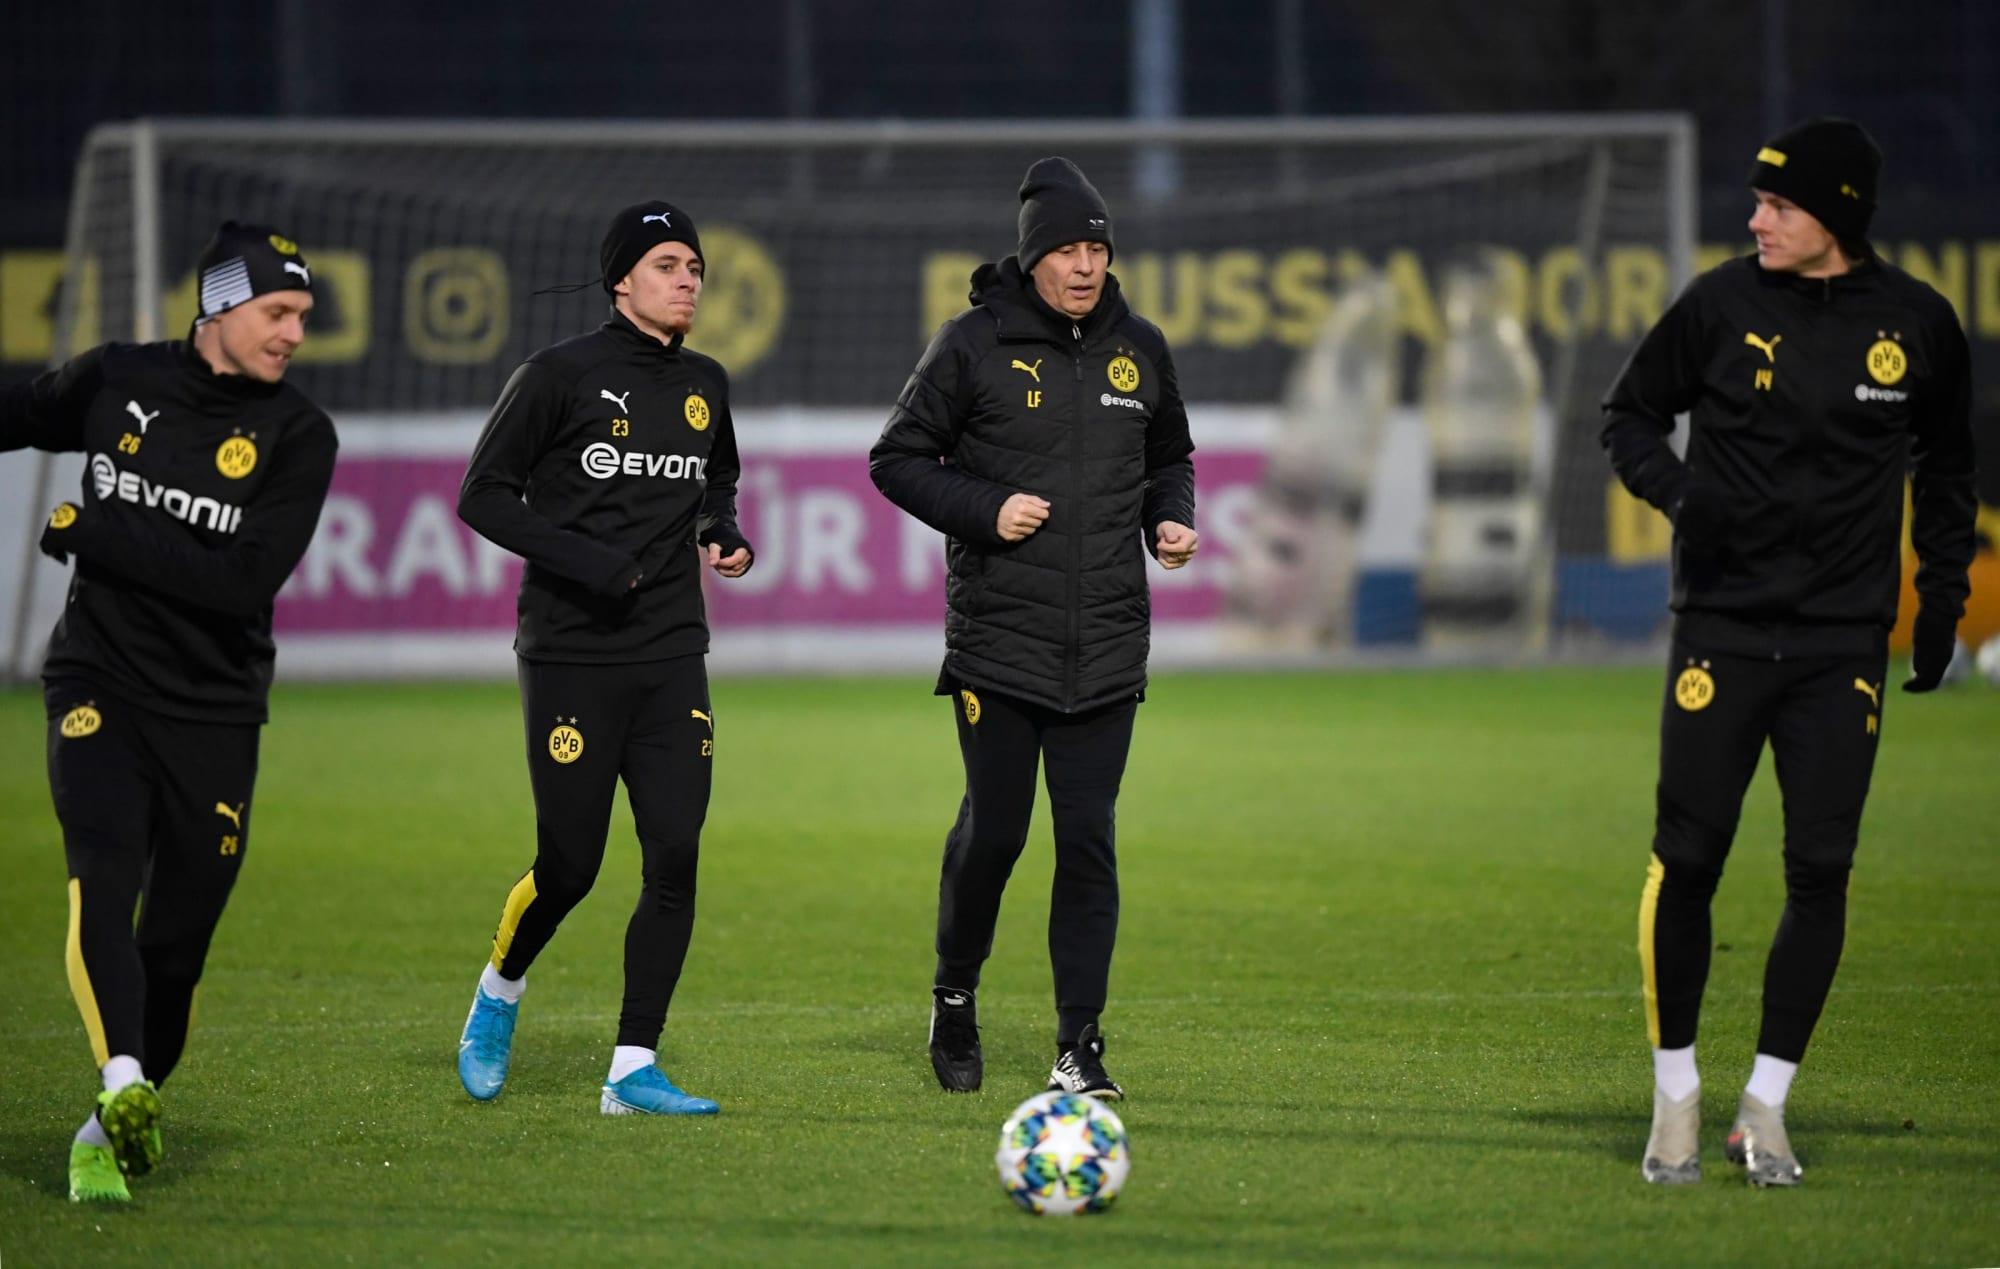 Watch Borussia Dortmund Vs Slavia Praha Live Stream TV